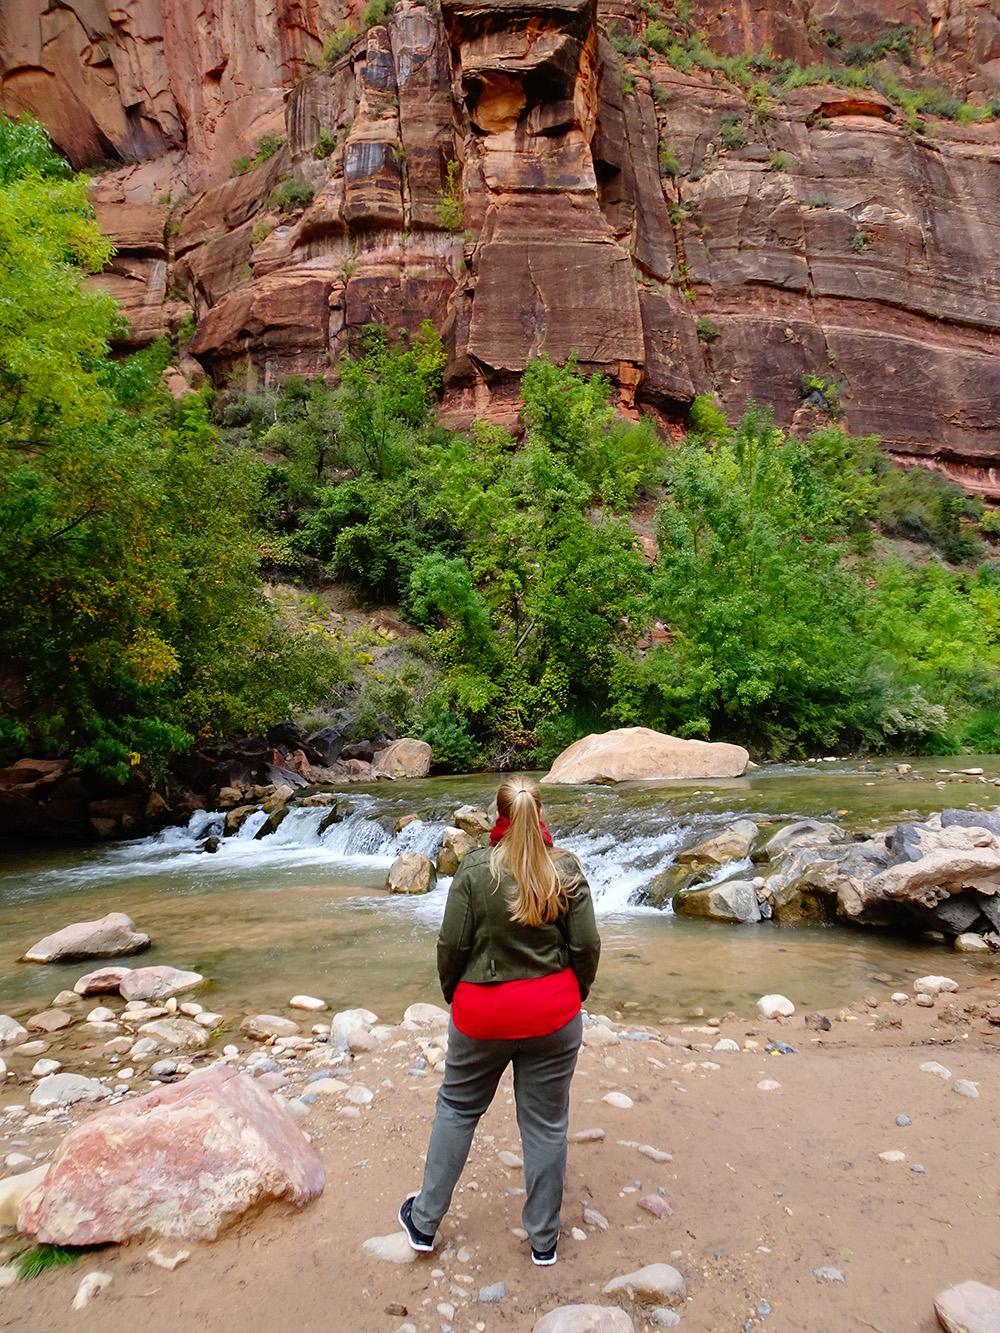 Gastblogger Valerie in de canyon